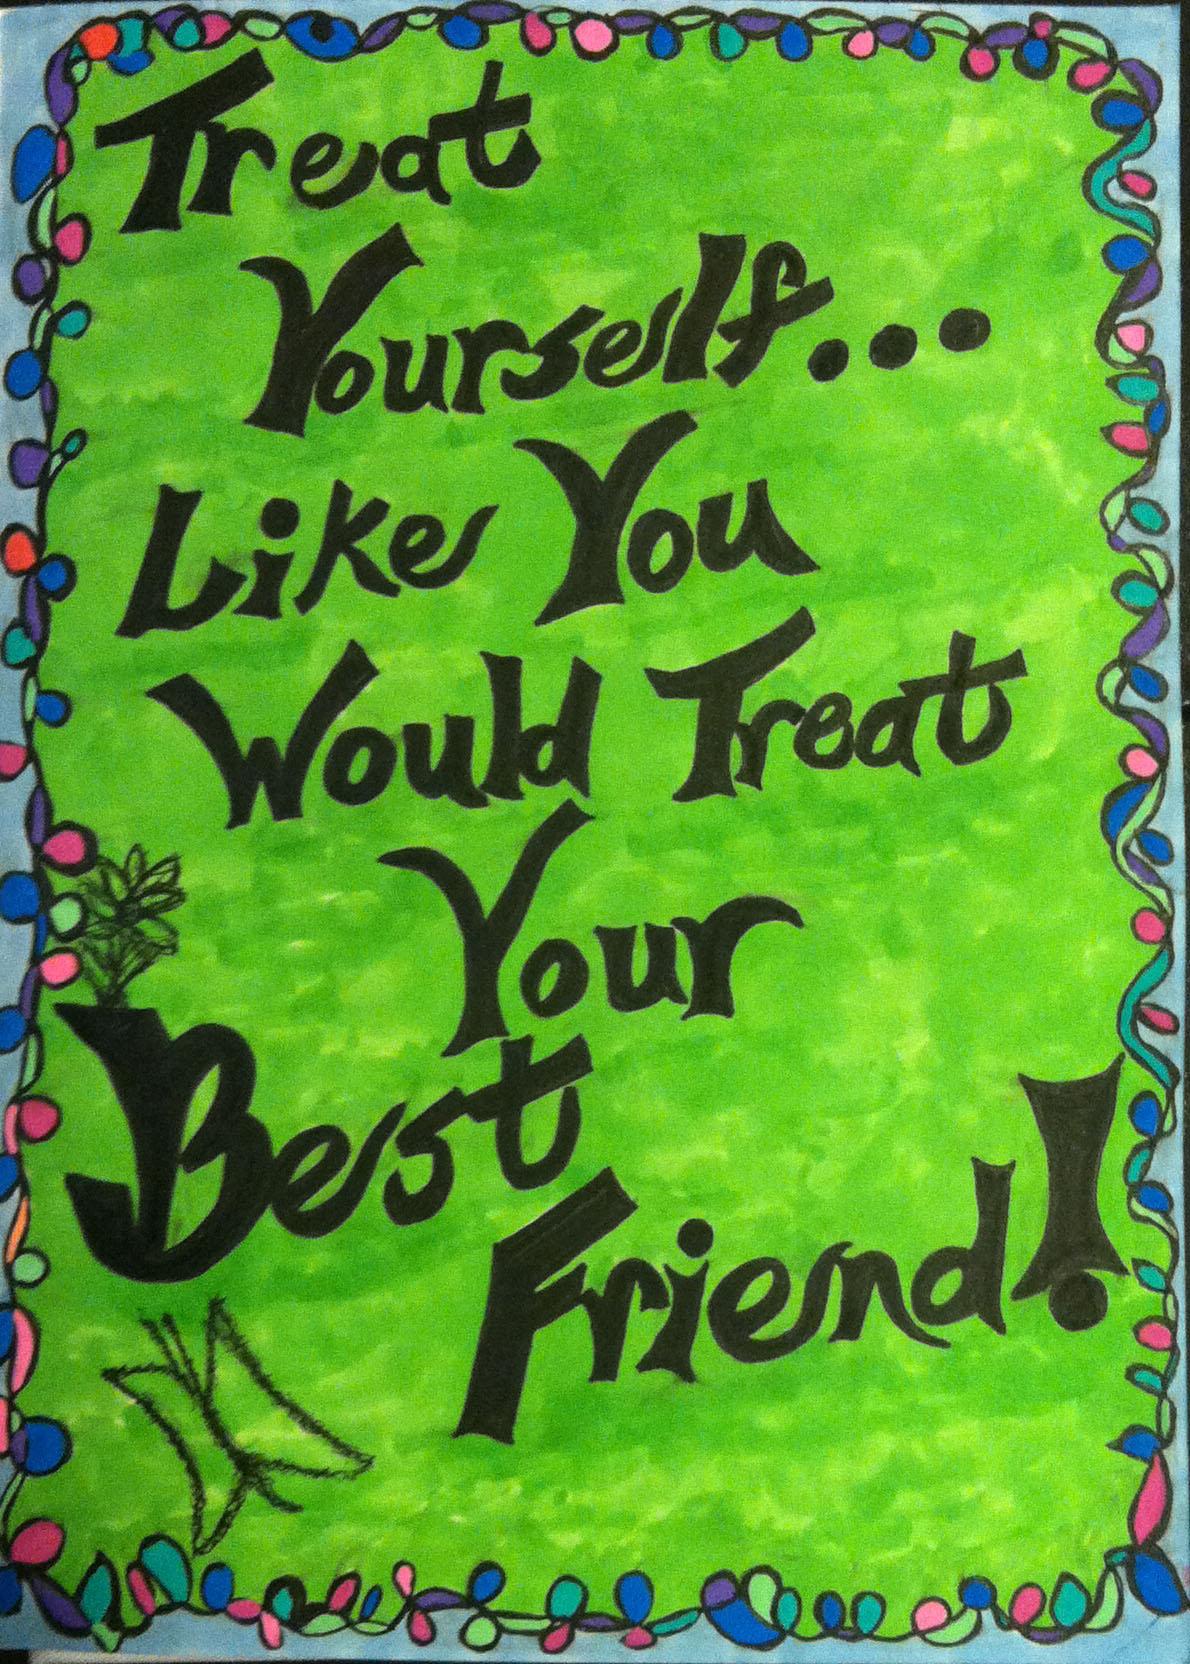 Liking Best Friend be Your Own Best Friend